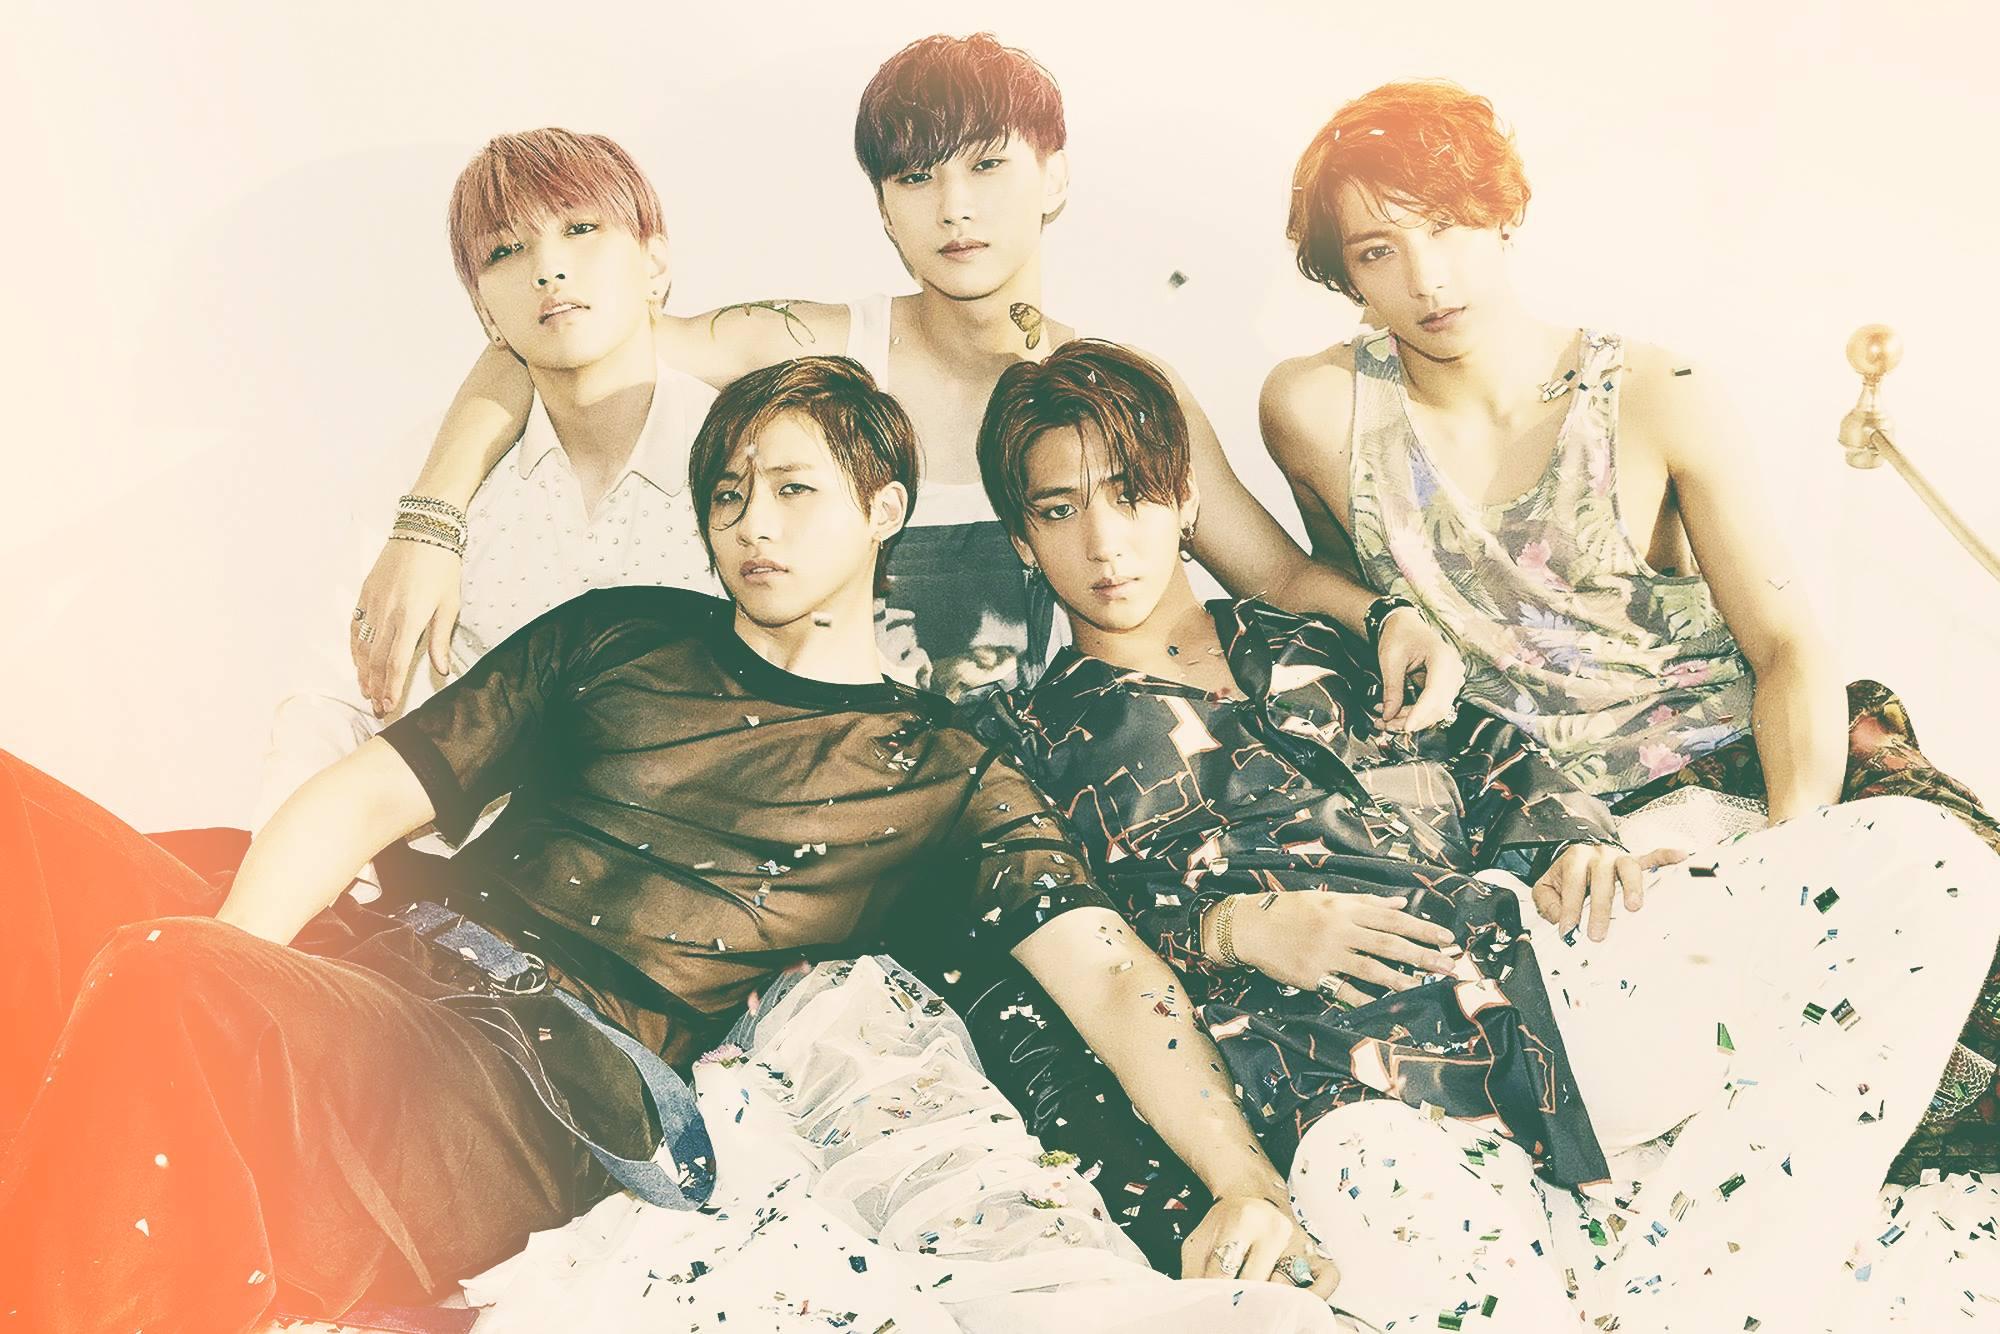 B1A4 - Only One 「想哭的時候就哭吧!不要故意忍住悲傷,為了讓你可以再度微笑,我來抱抱你吧!難過的時候,我會借你我的肩膀讓你靠著休息。」